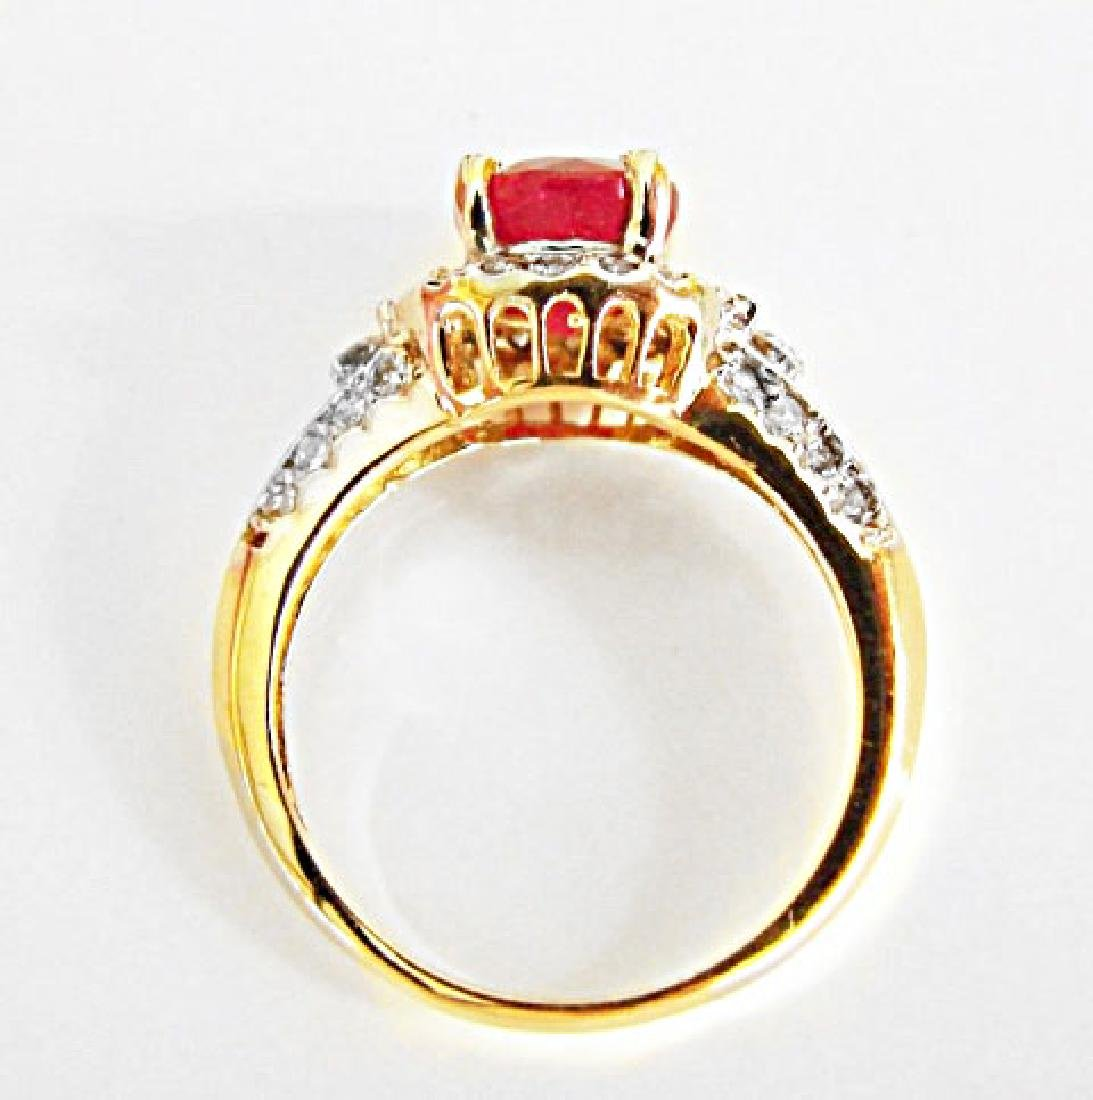 Ruby Diamond Ring 2.37Ct 14k Yellow Gold - 3